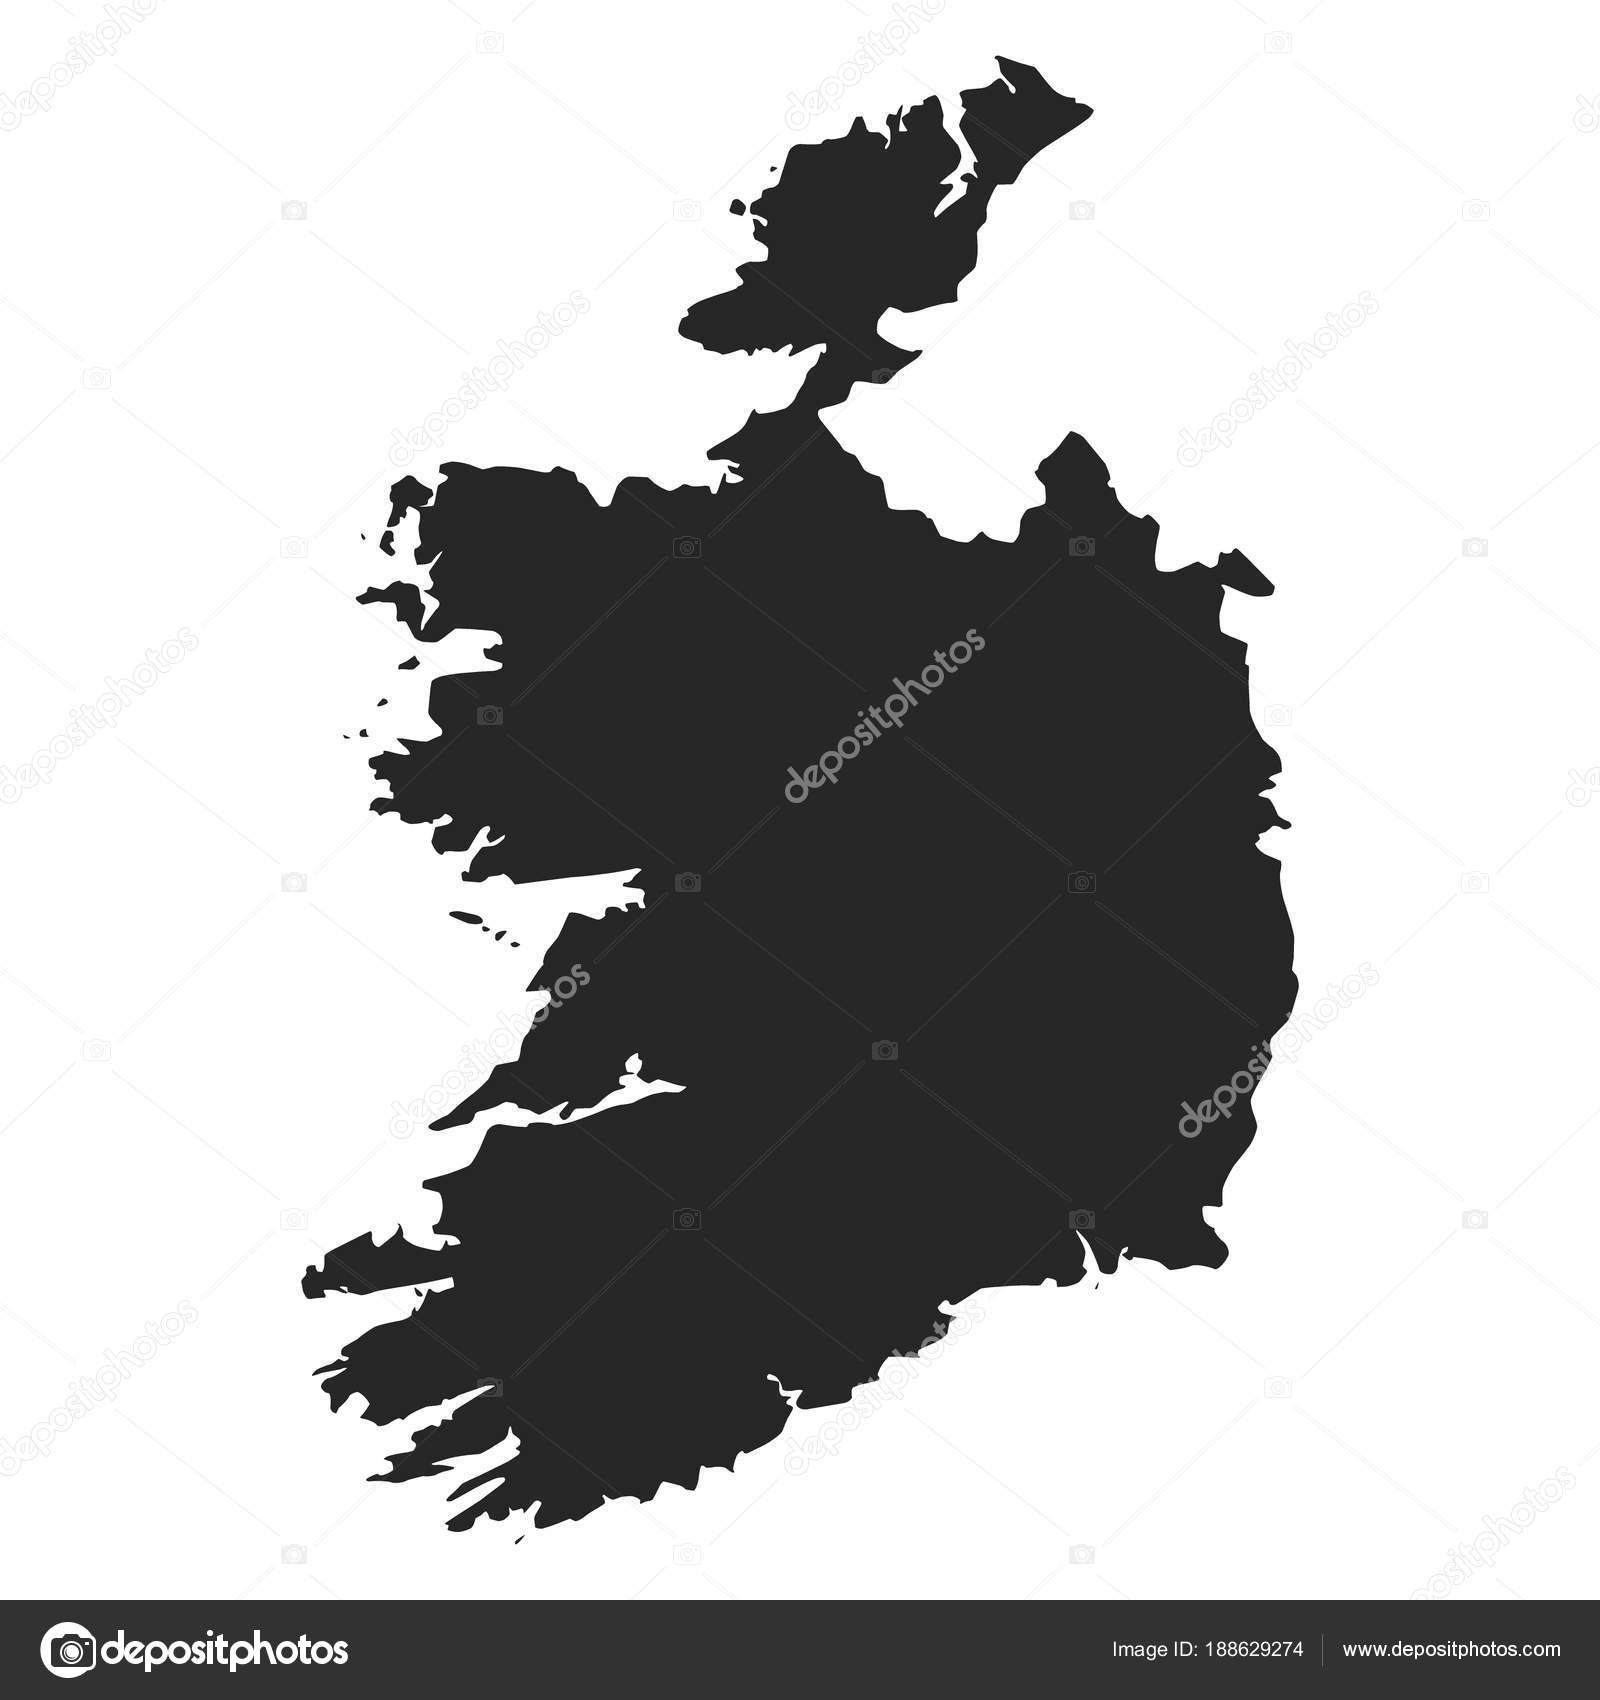 Carte Irlande Simple.Irlande Carte Simple Noir Blanc Silhouette Image